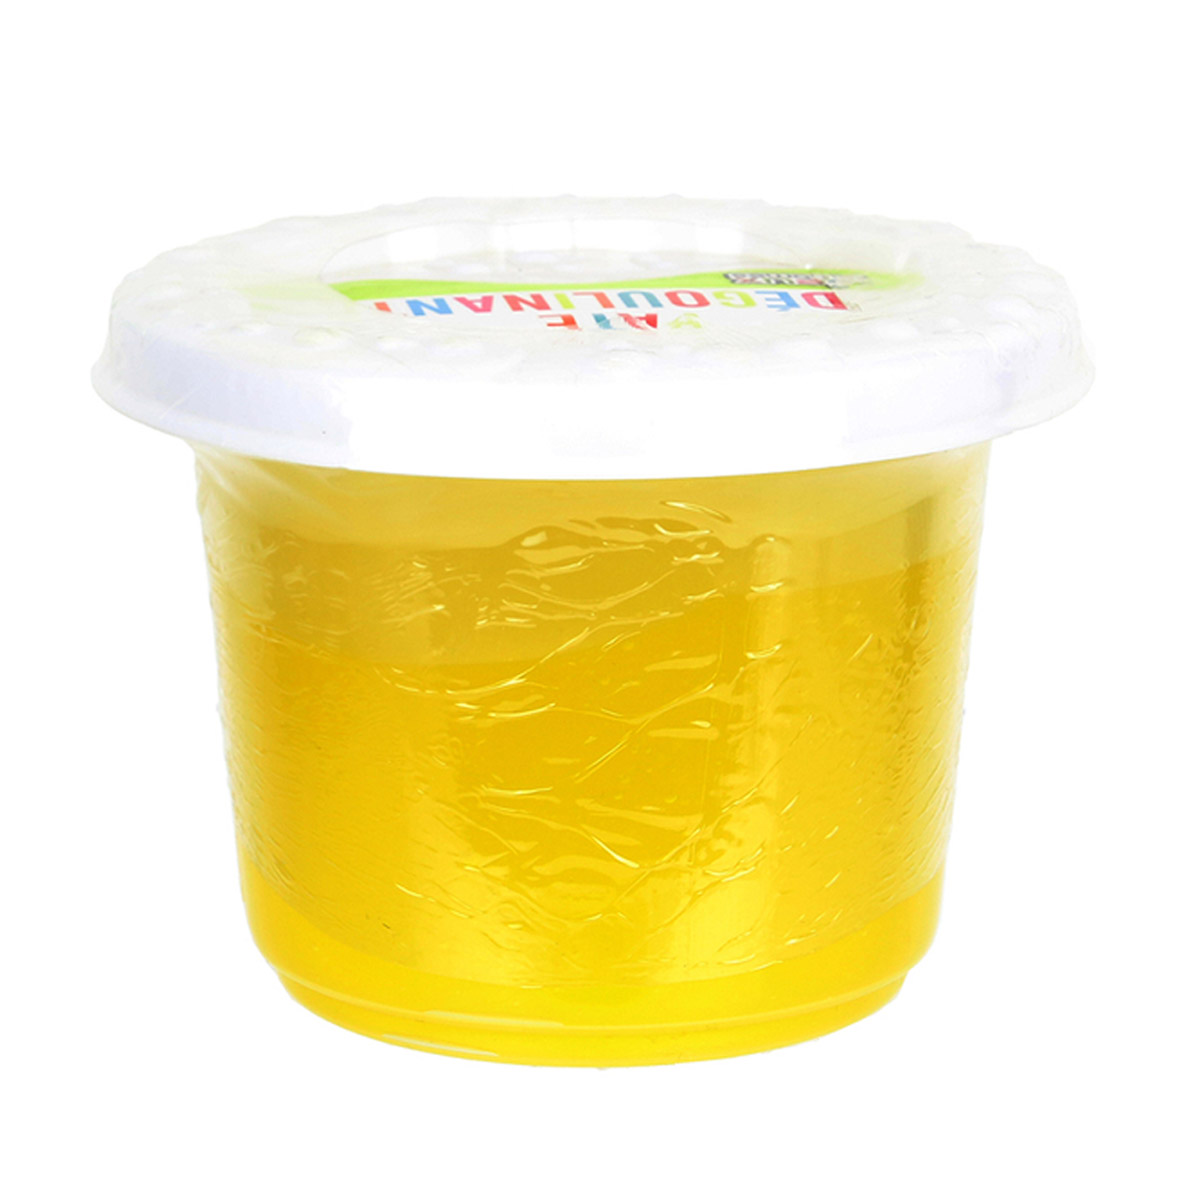 Pate gluante et dégoulinante \'Slime\' jaune - 500g - [R2376]